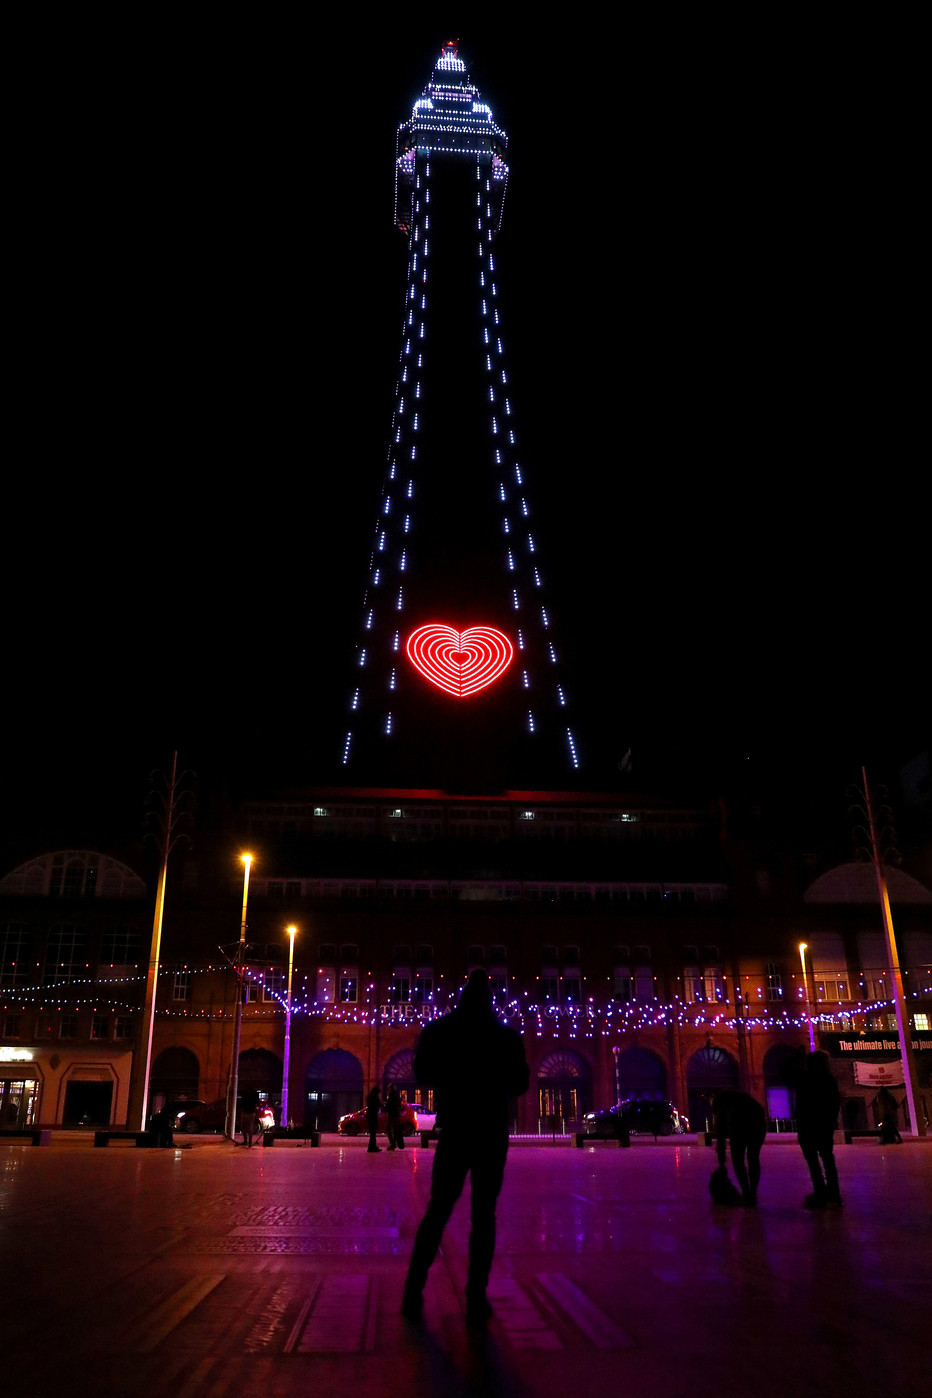 Blackpool Tower - COVID-19